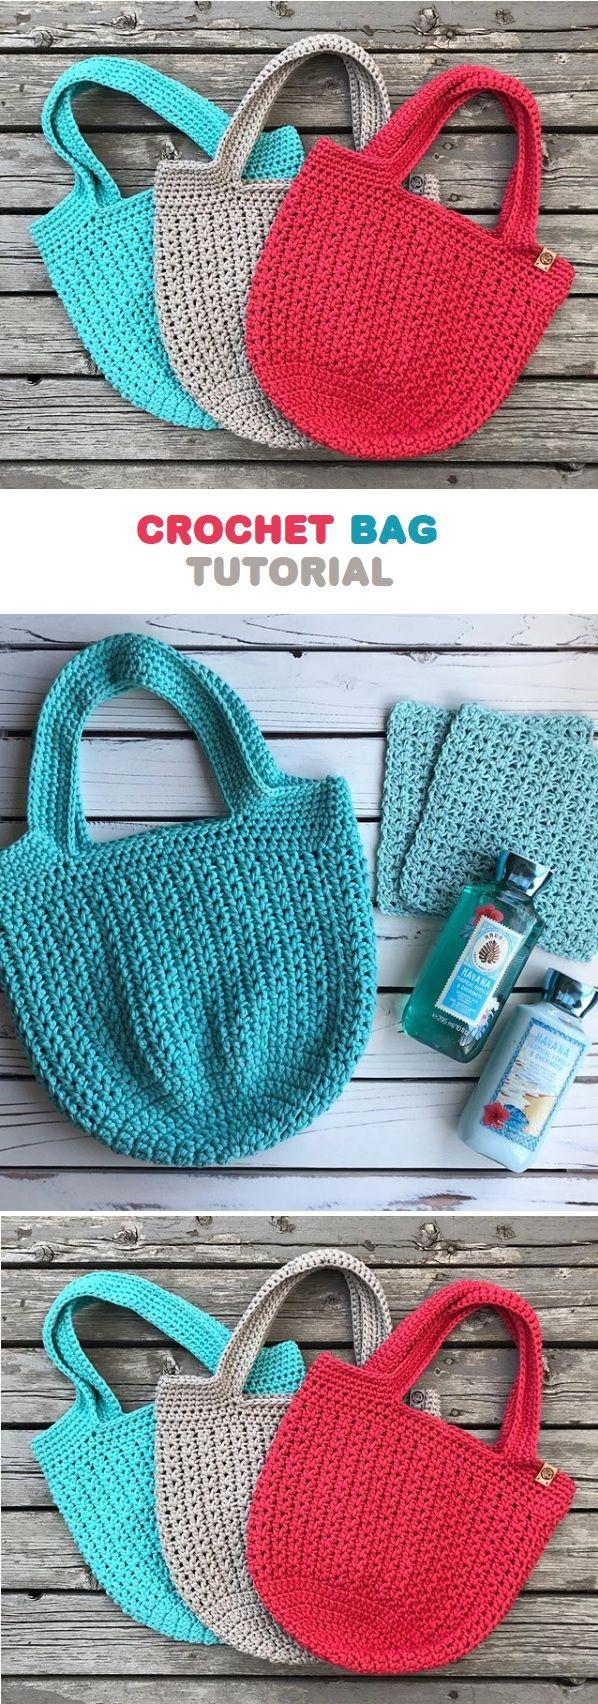 Crochet Bag Pattern – Handmade paris